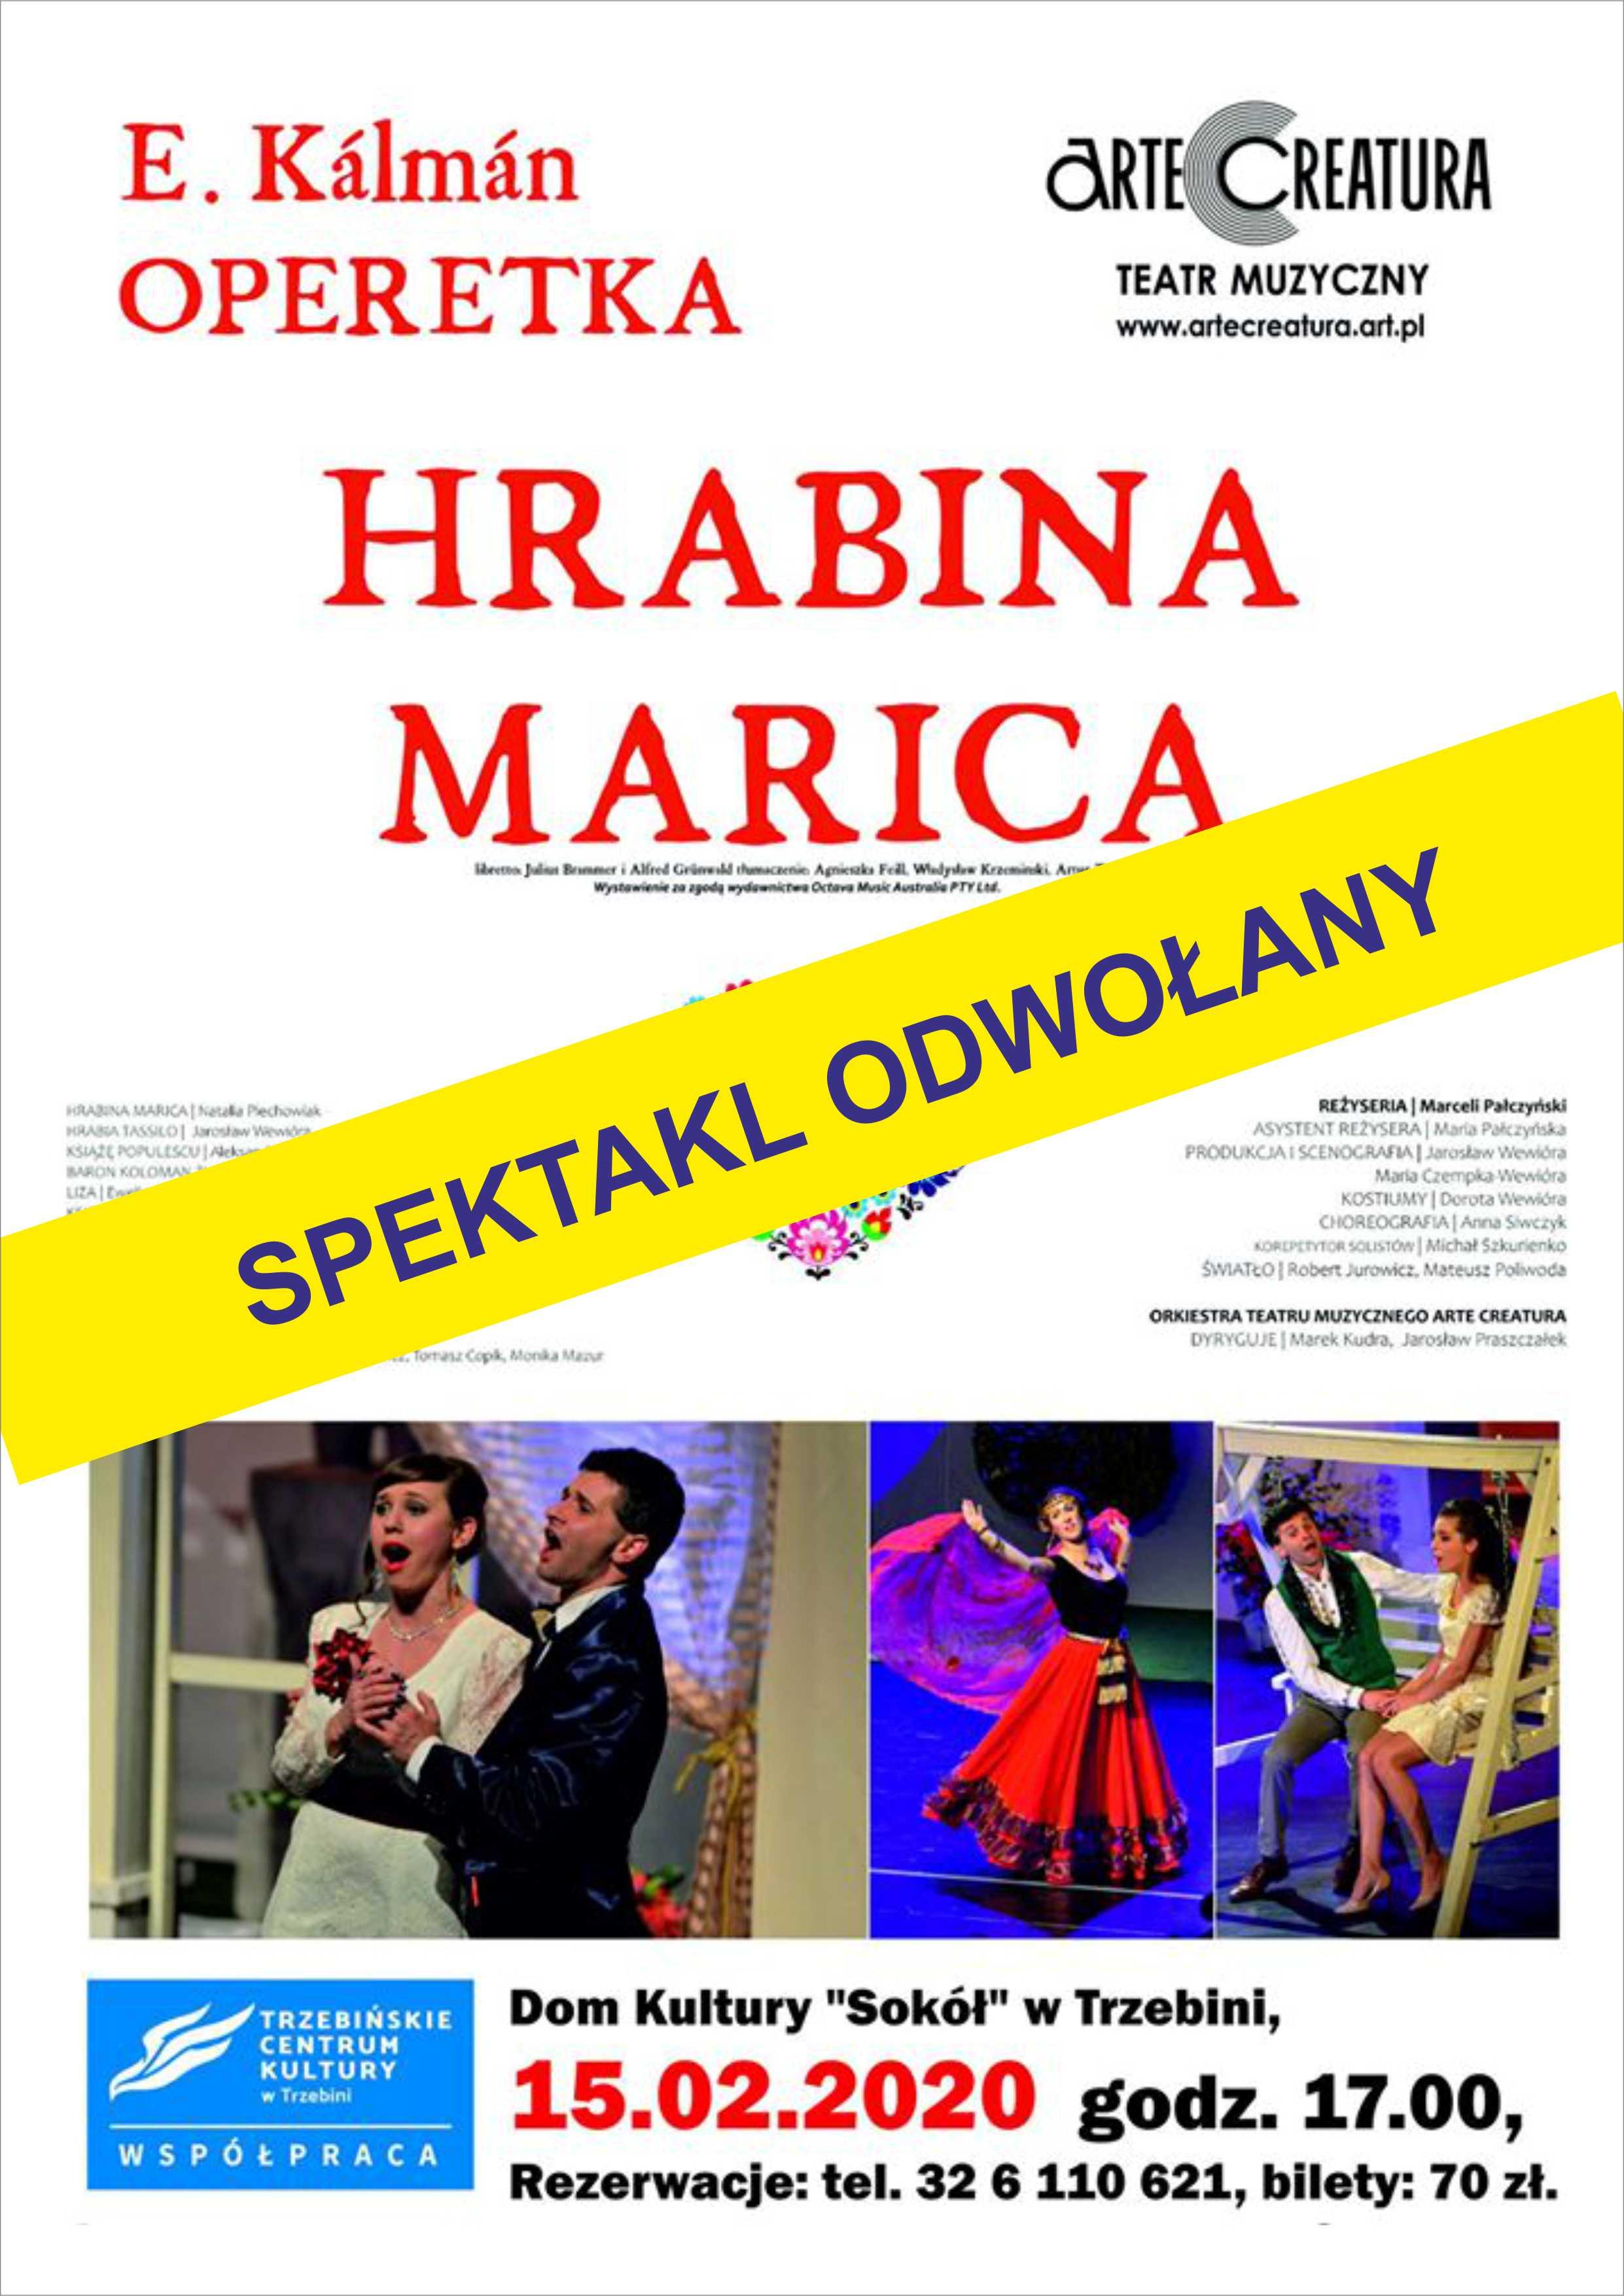 HRABINA MARICA